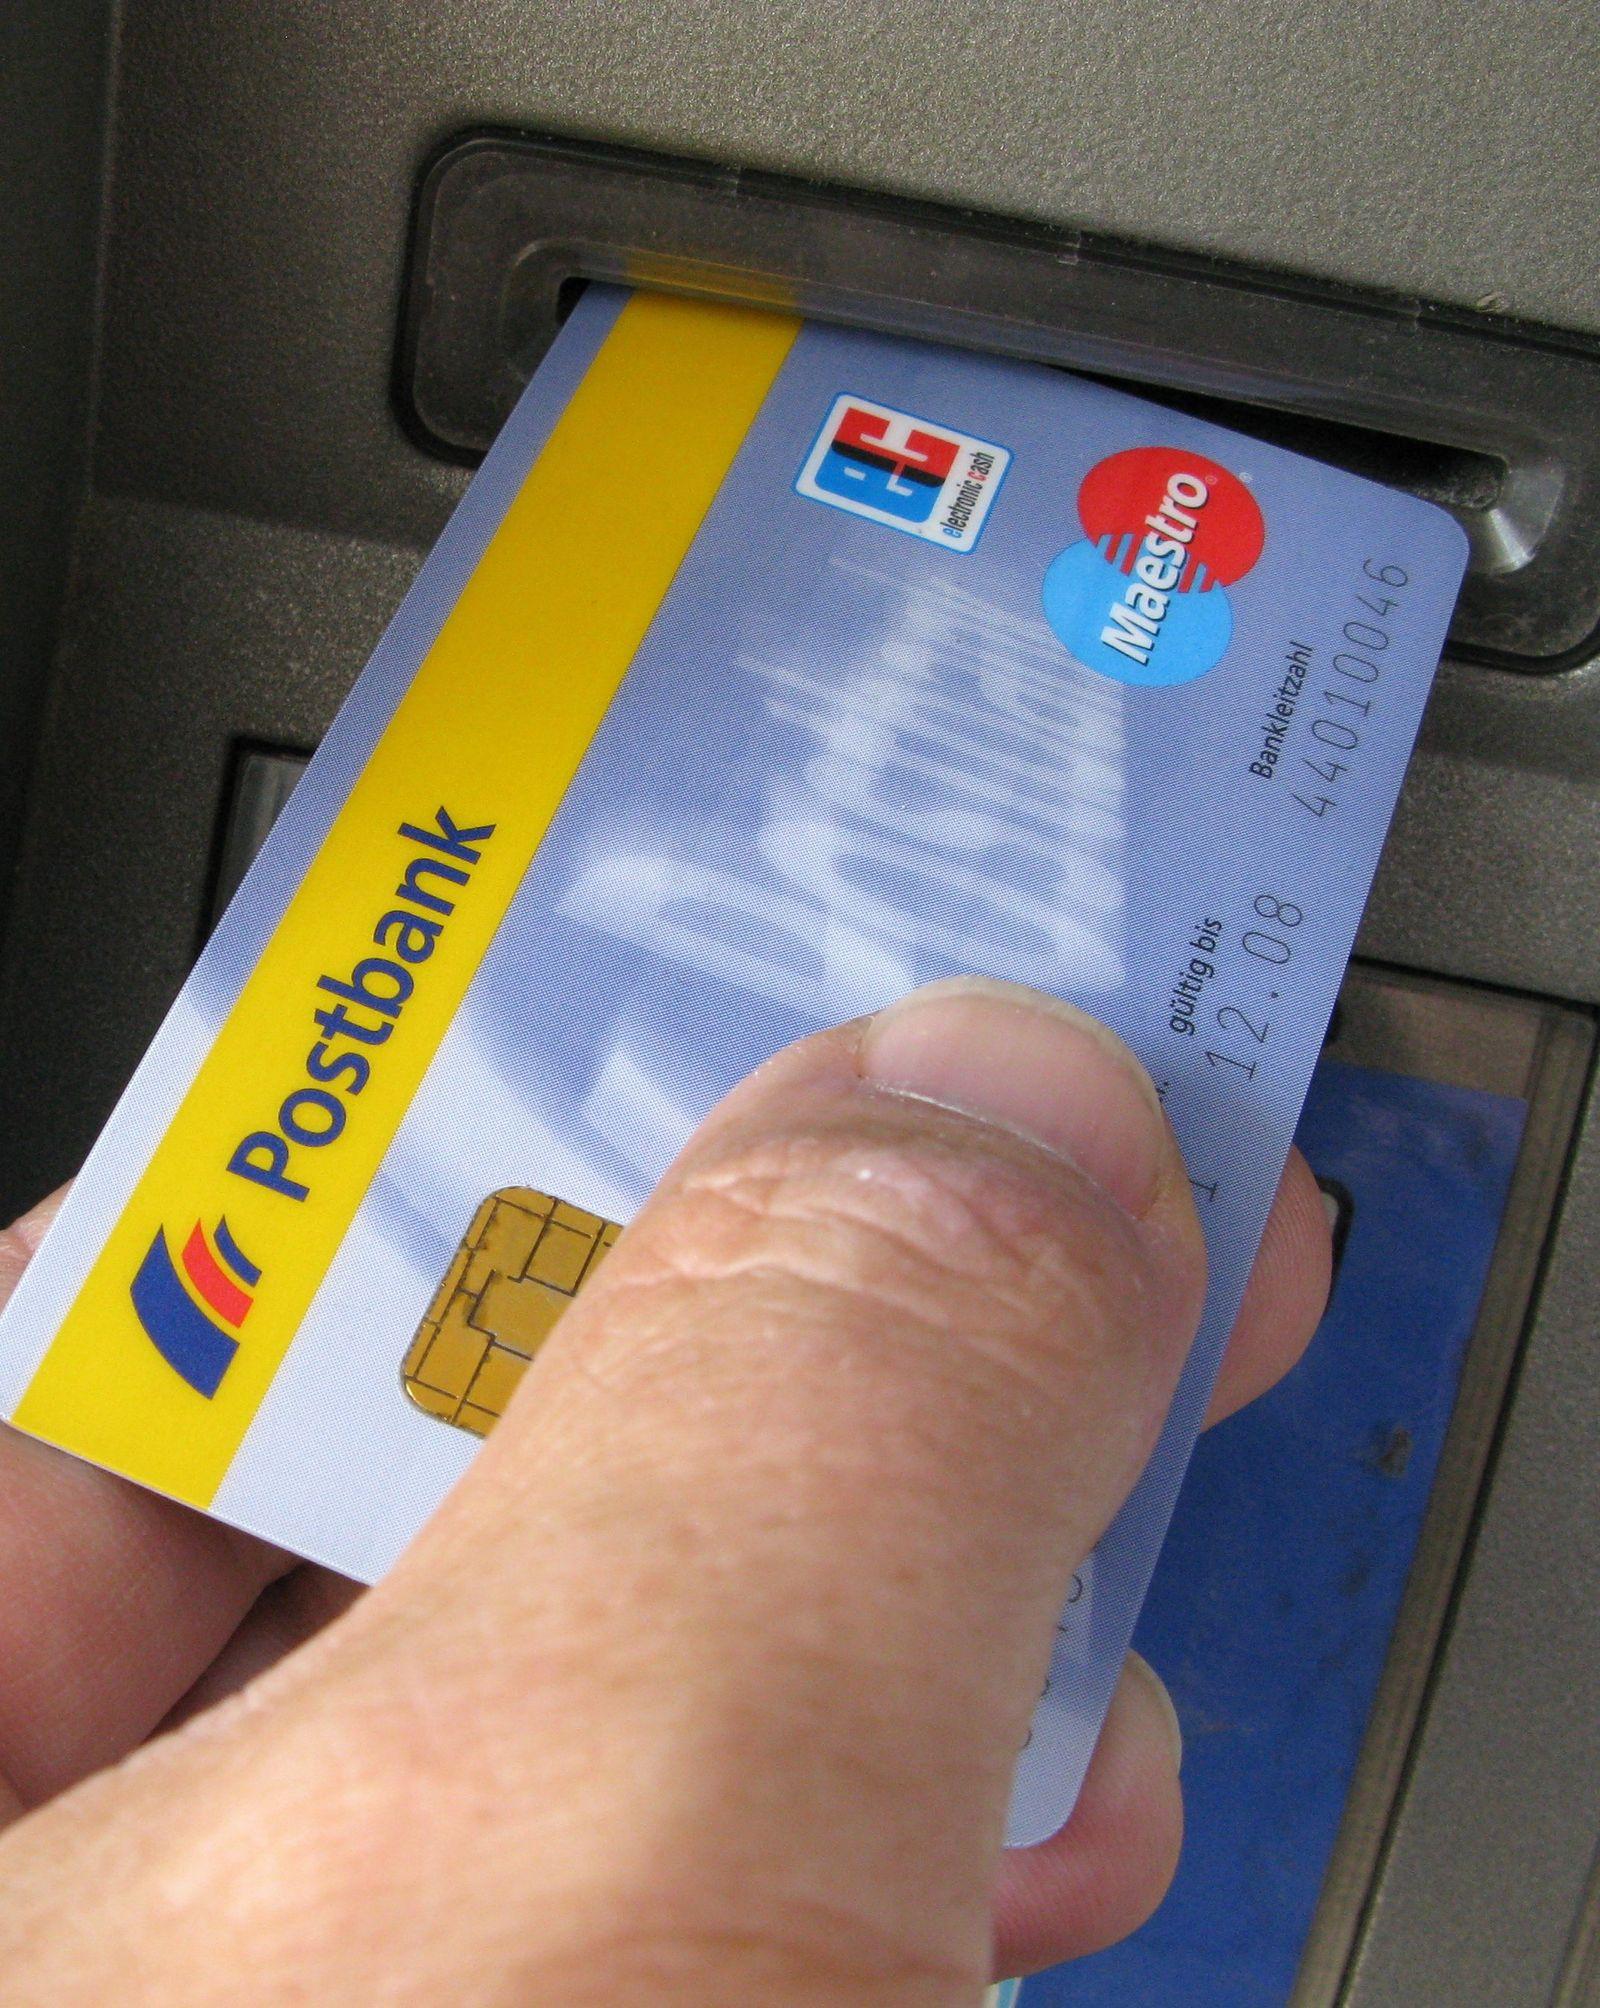 Postbank / EC Karte / Geldautomat